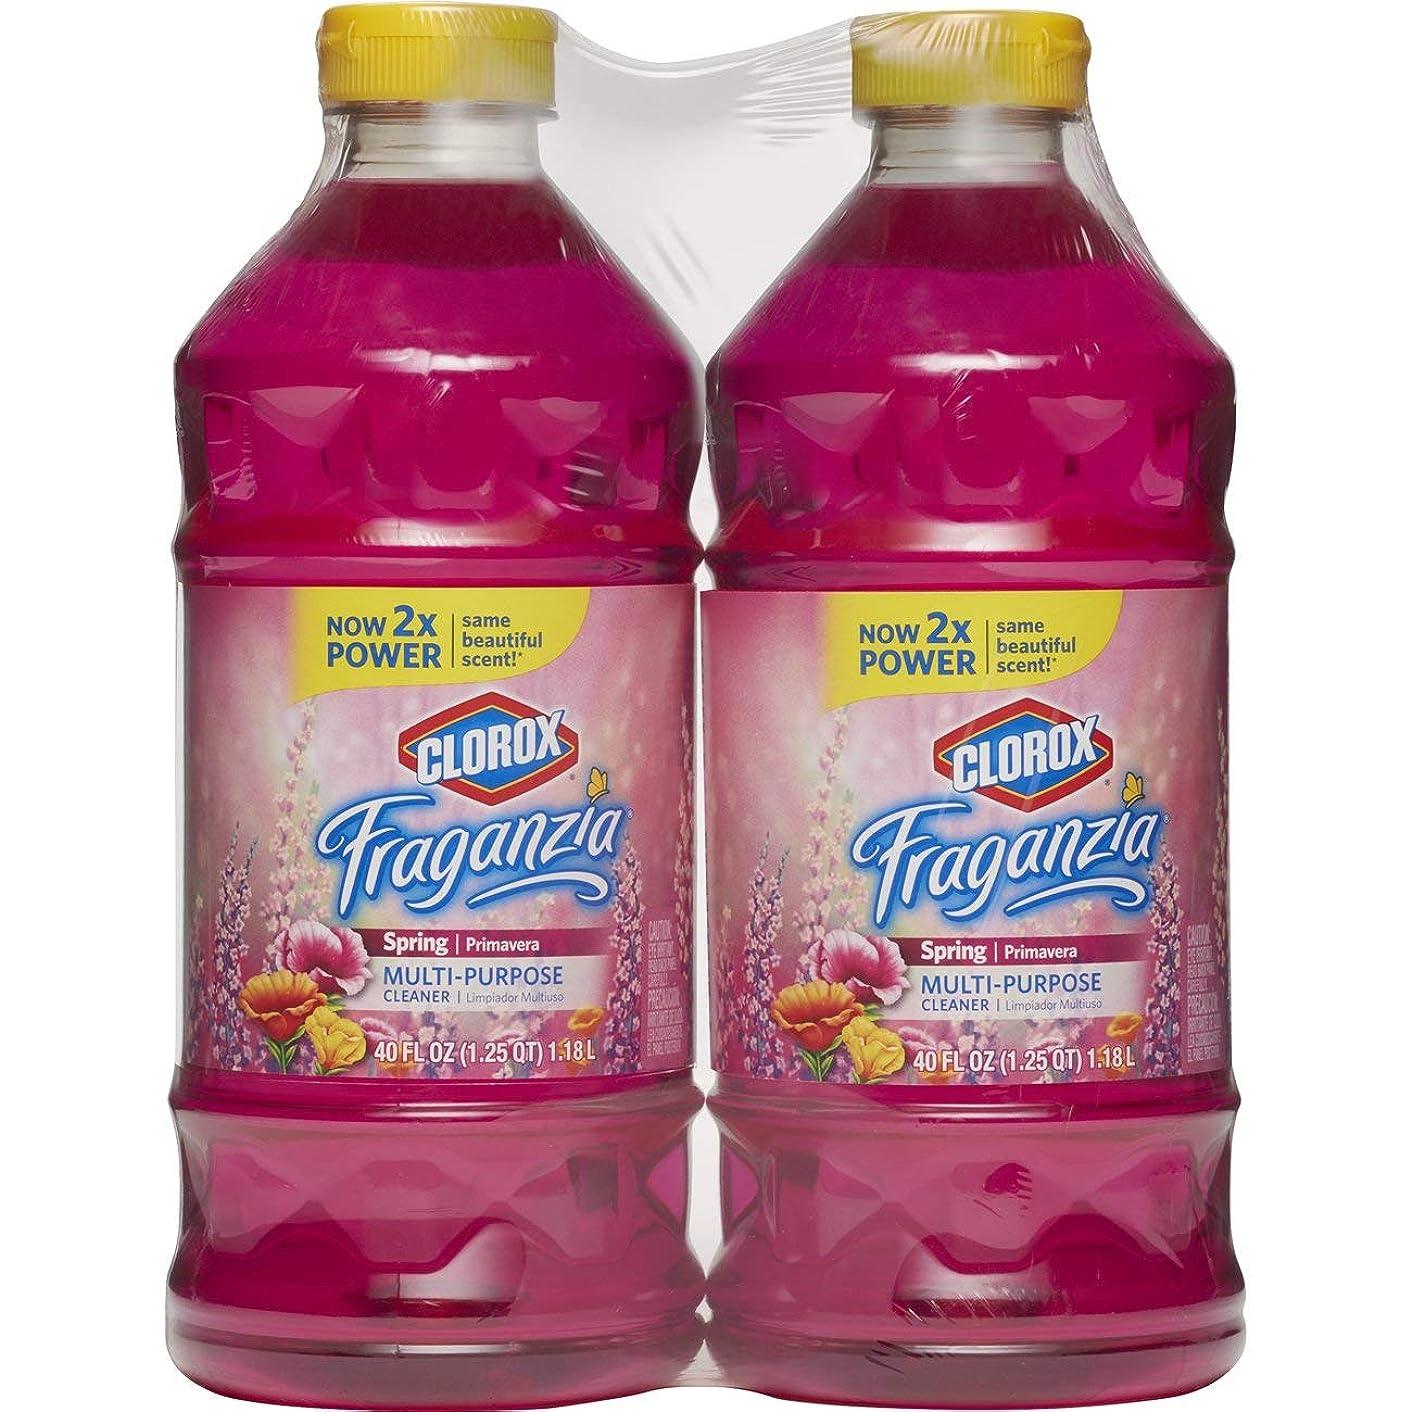 Clorox? Fraganzia? Multi-Purpose Cleaner, Spring Scent, Two 40 Fl. Oz Bottles (80 fl oz total)